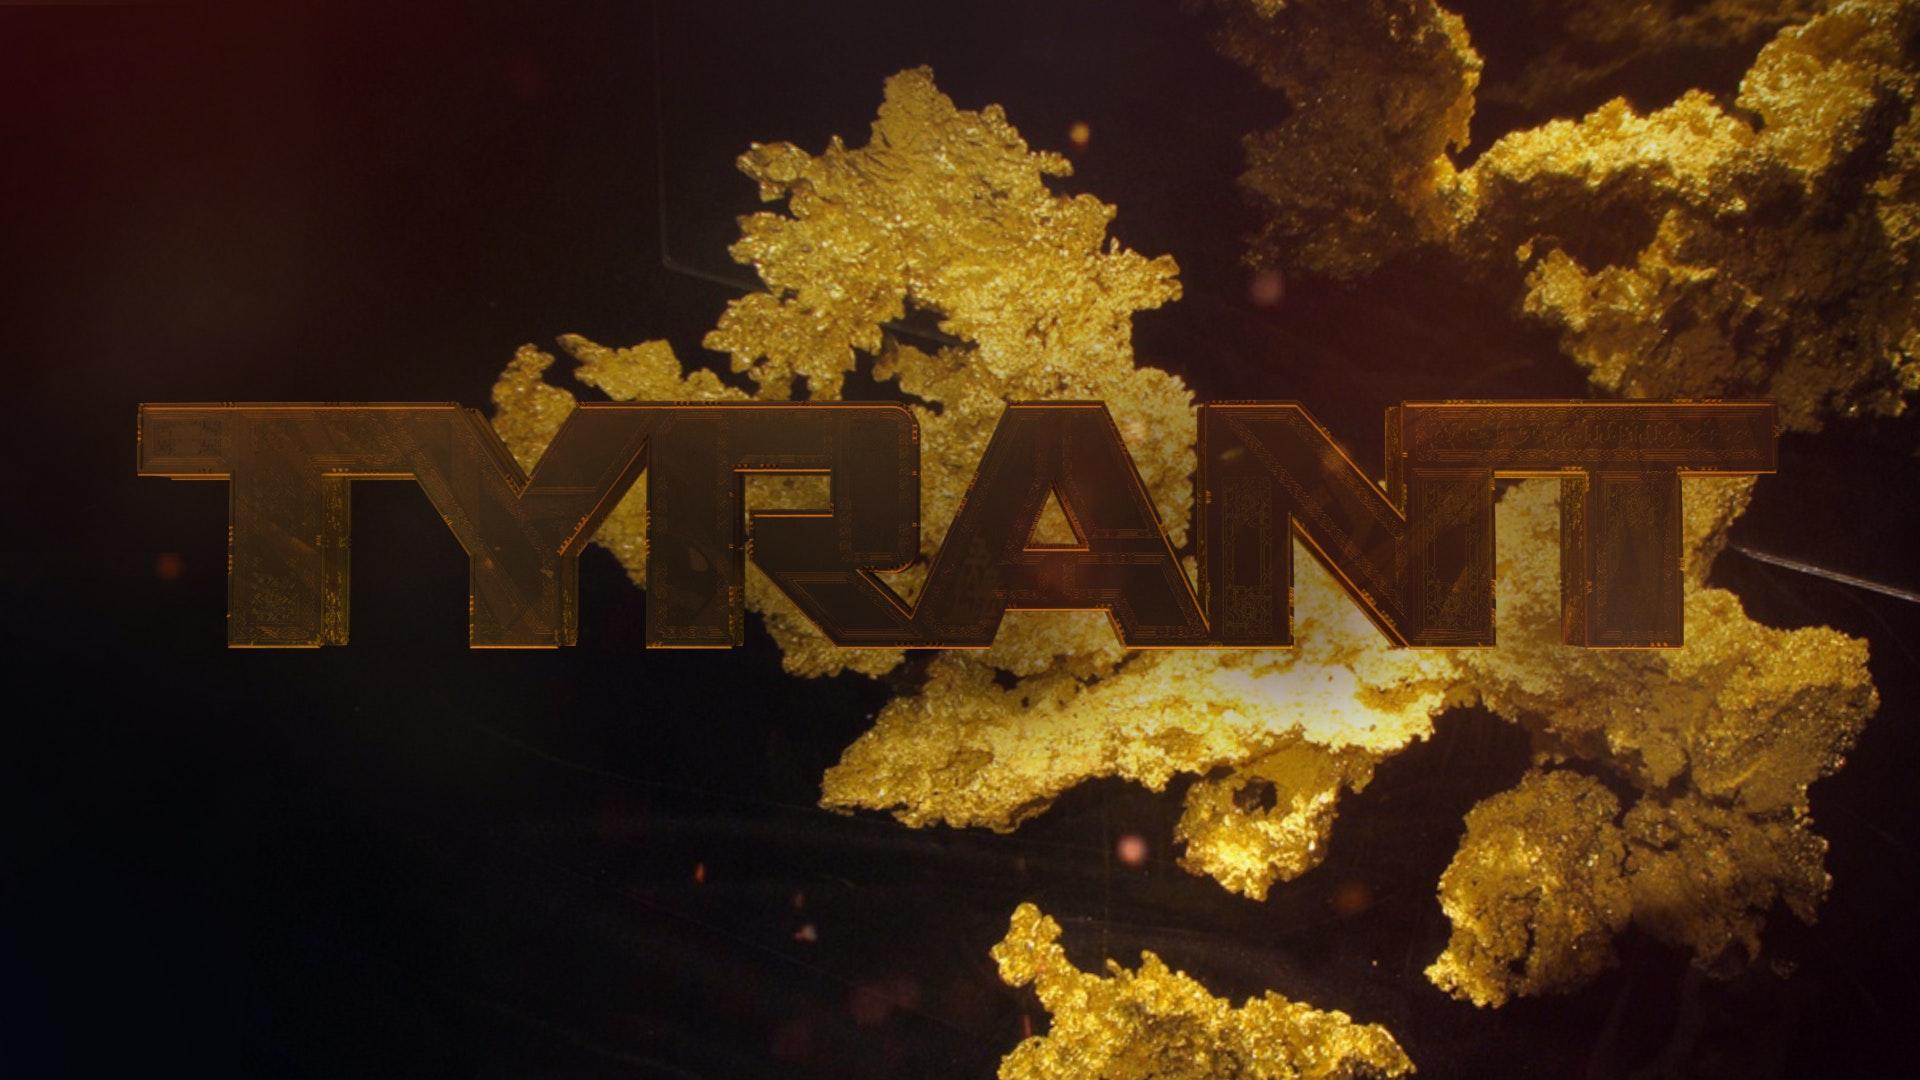 VINICIUS NALDI - Tyrant_Dir2_001